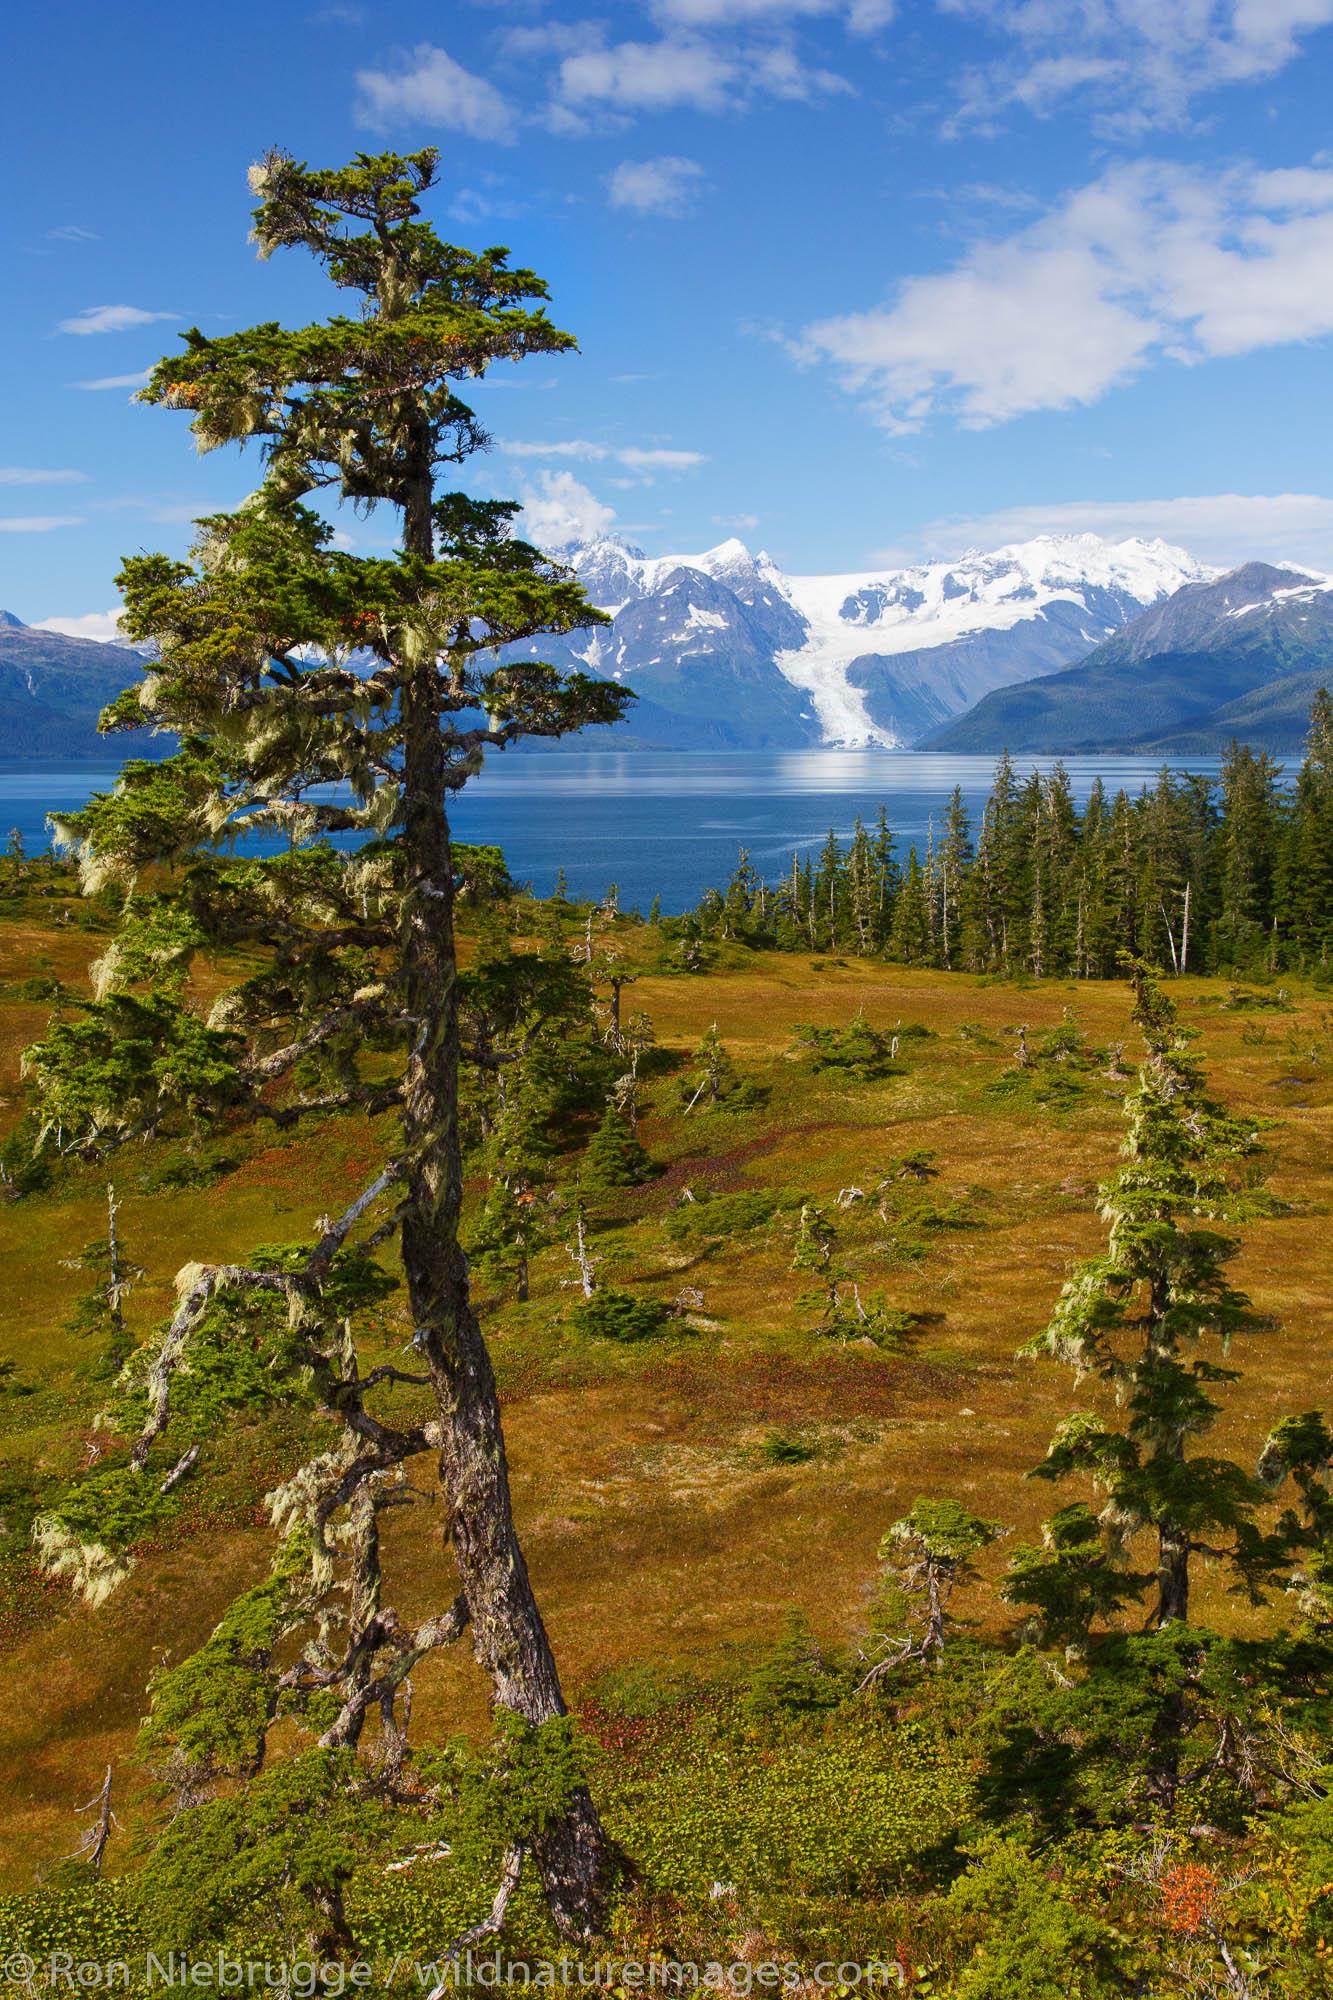 Along Esther Passage and Port Wells, Prince William Sound, Chugach National Forest, Alaska.